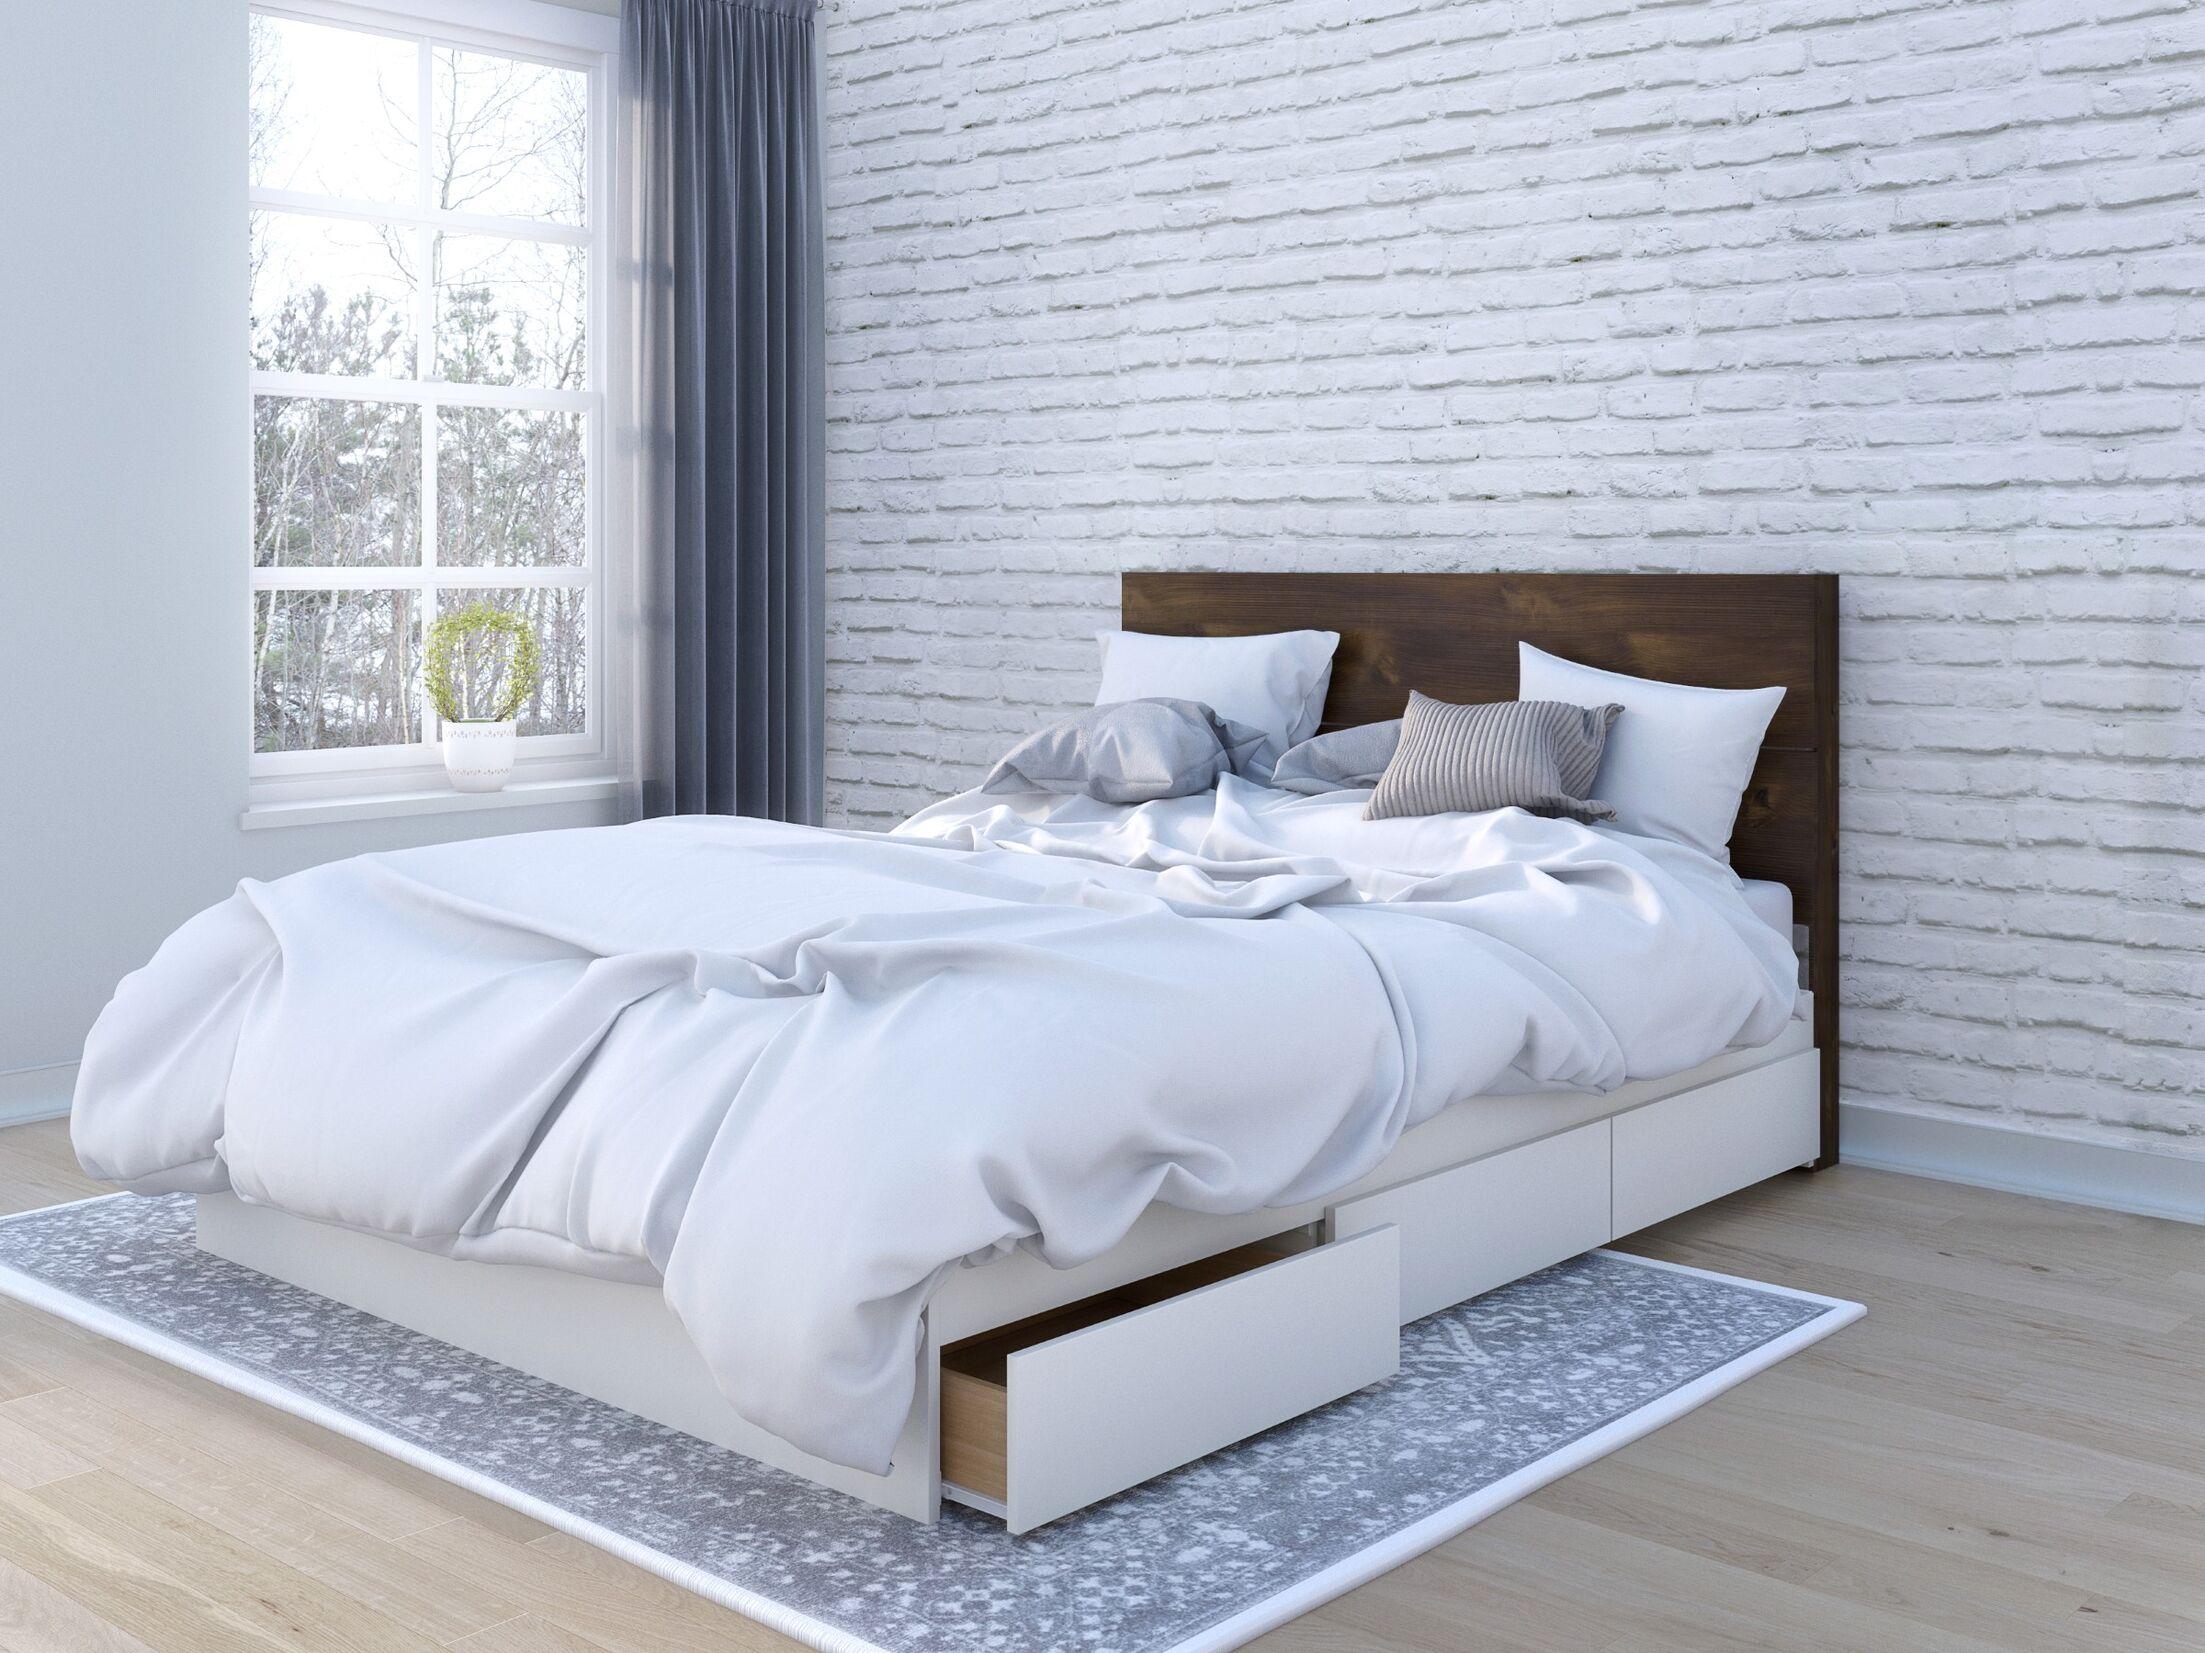 Mcinnis Storage Platform Bed Size: Queen